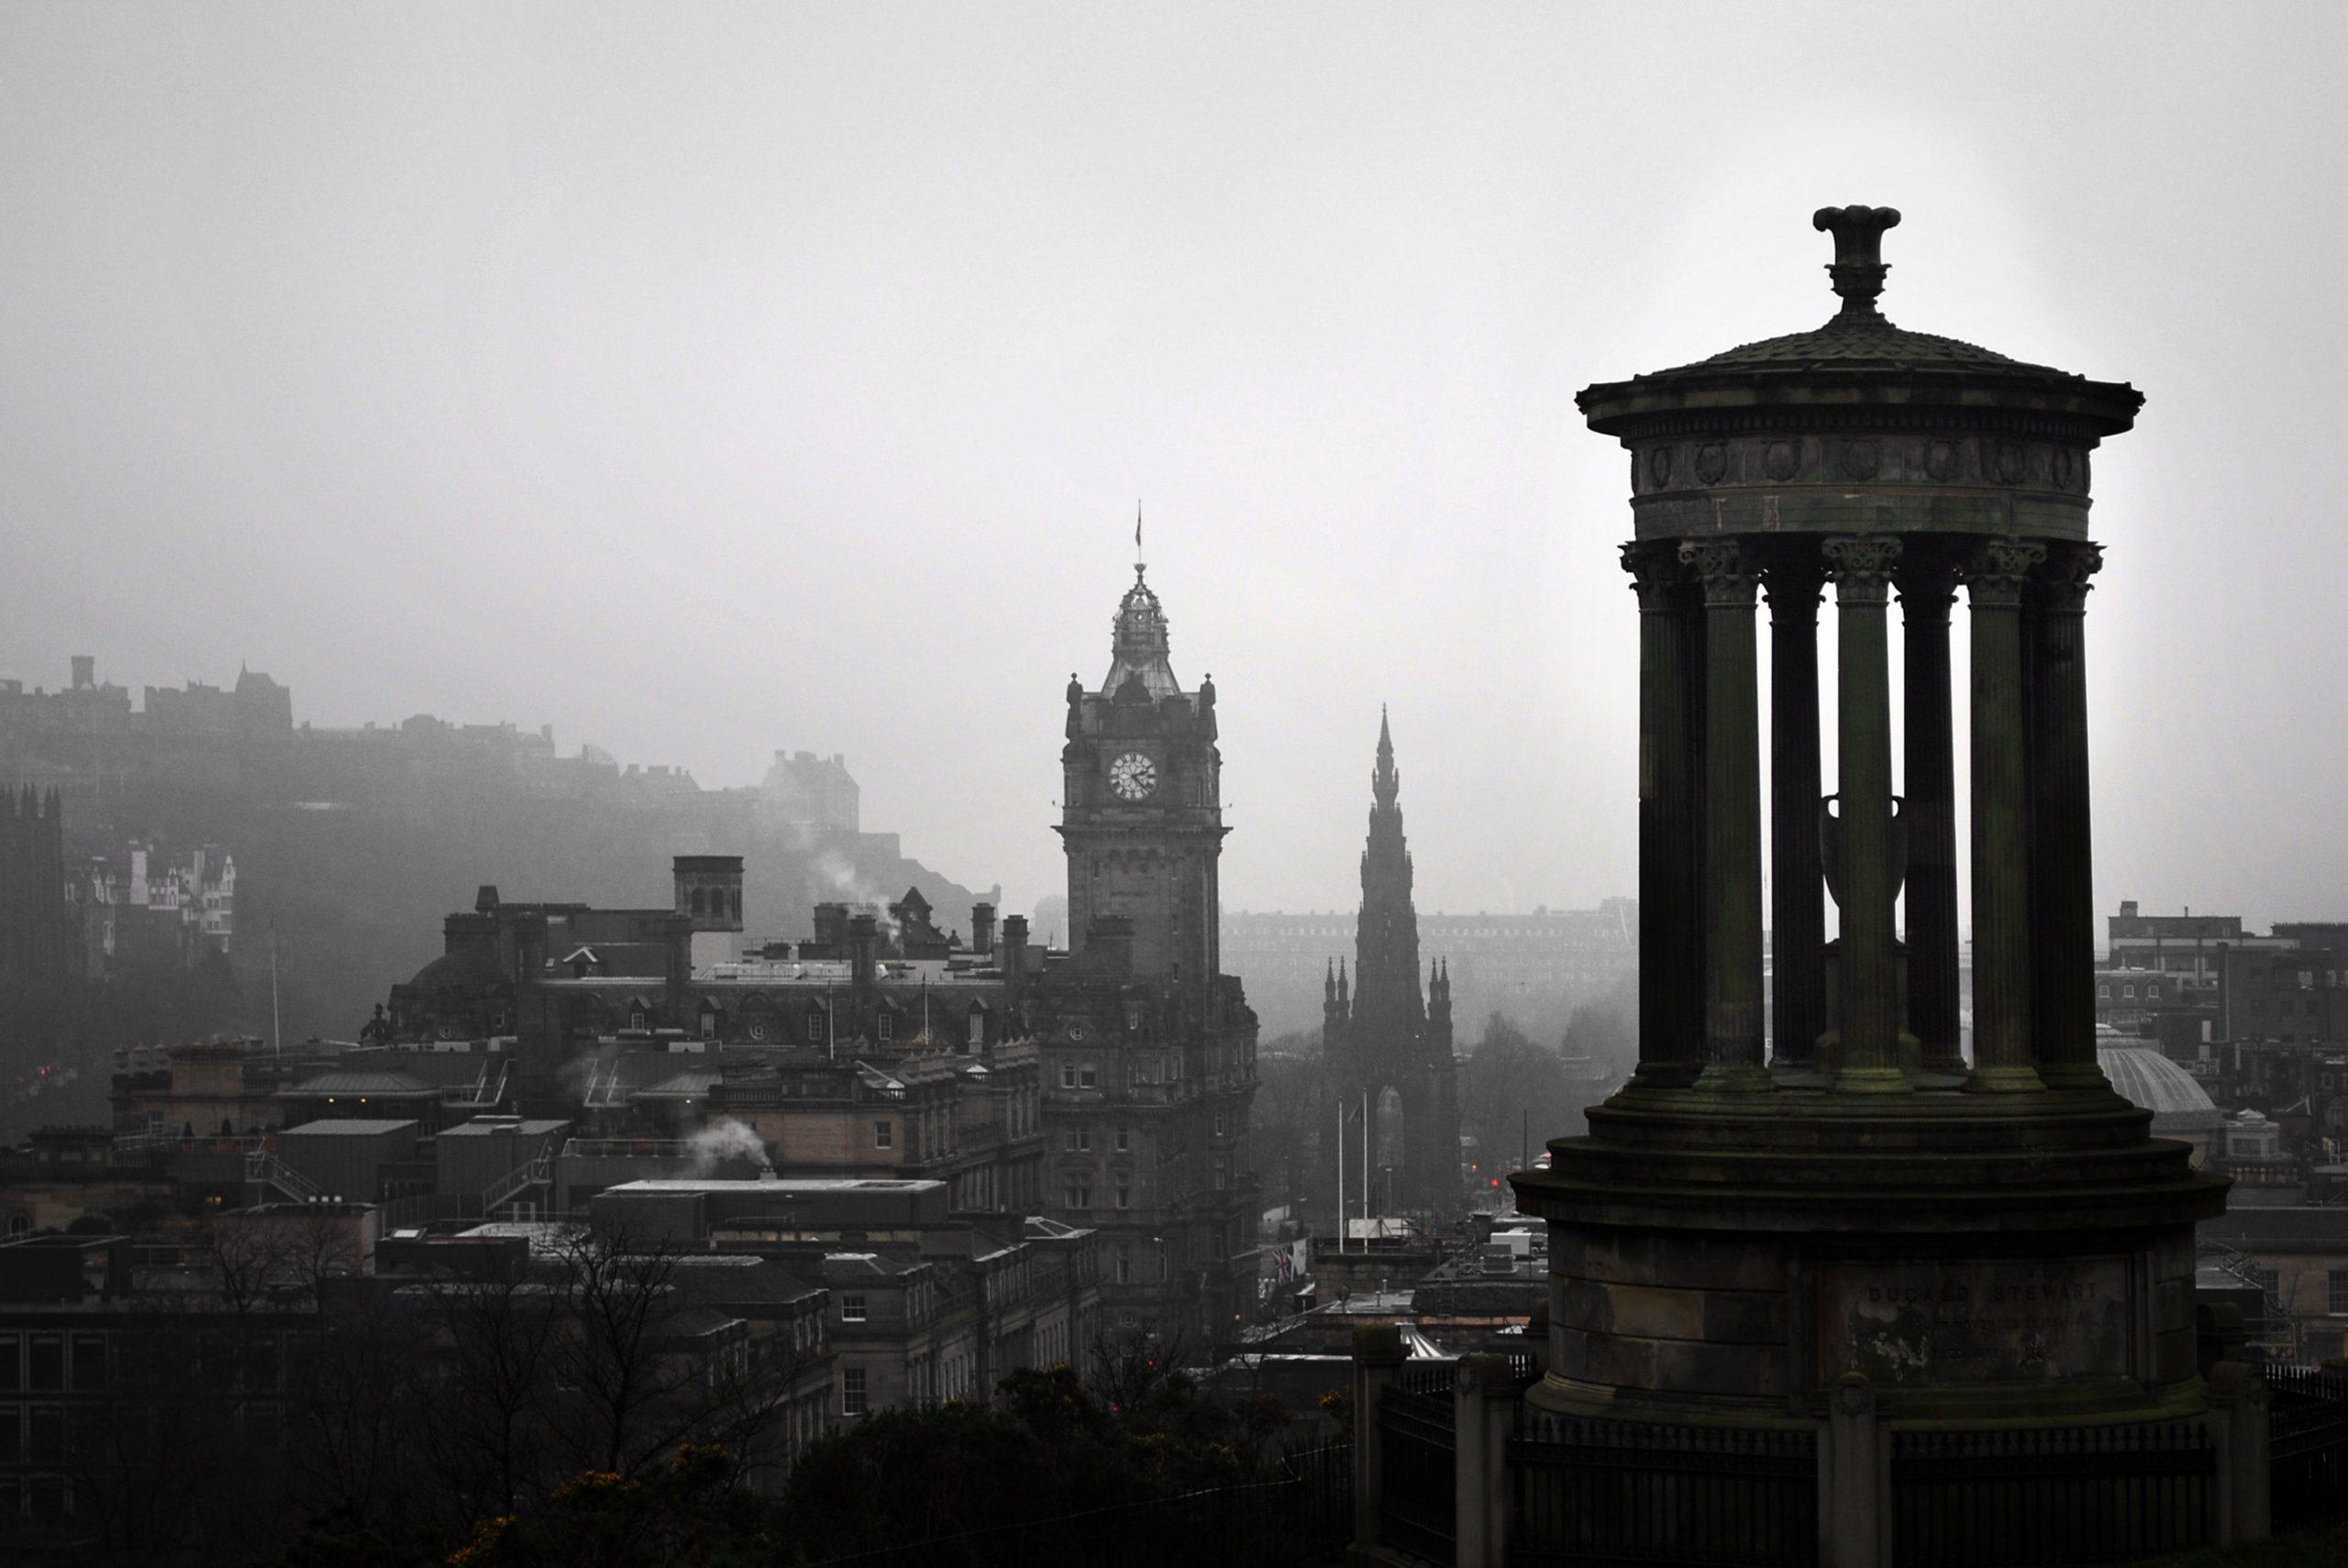 Calton Hill, Edinburgh (image courtesy of Pixabay)